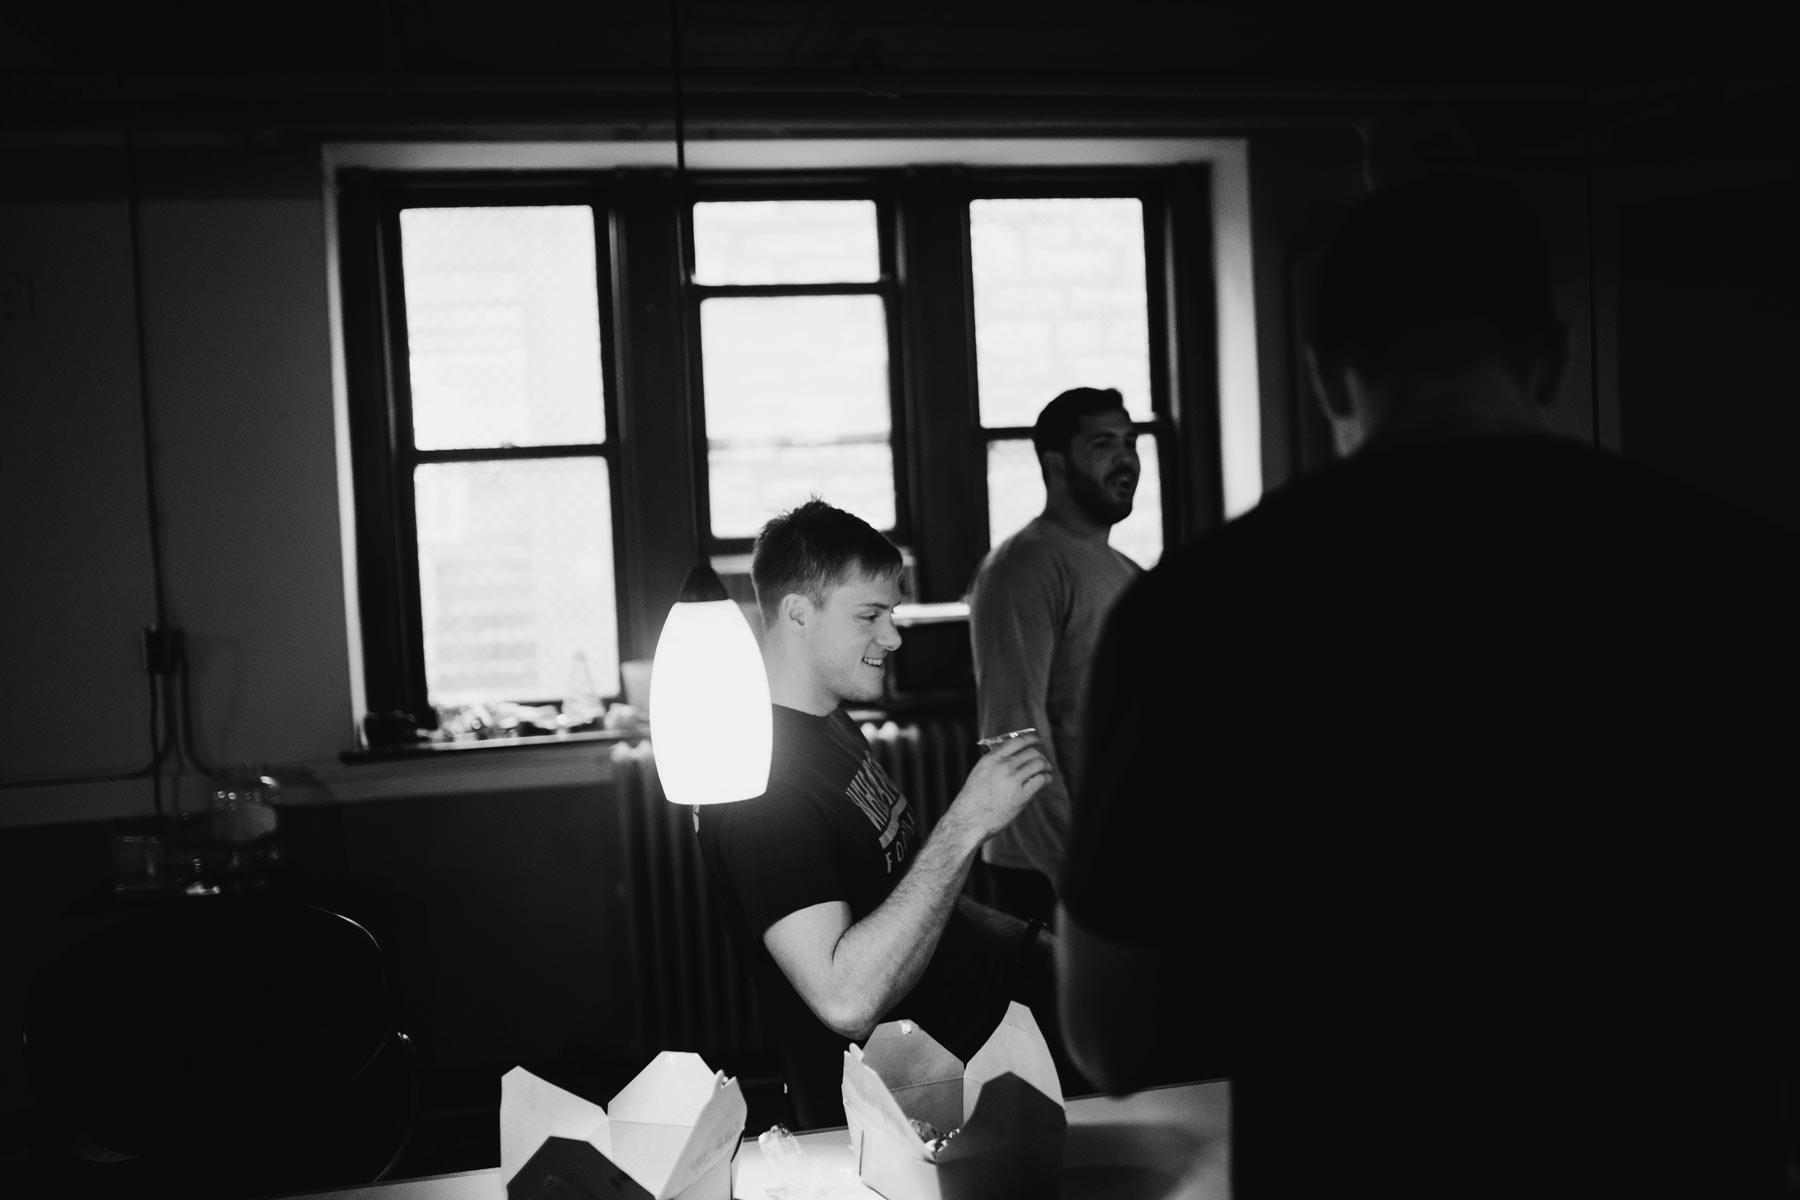 Memorial Presbyterian Wedding in St. Louis Missouri_Kindling Wedding Photography025.JPG